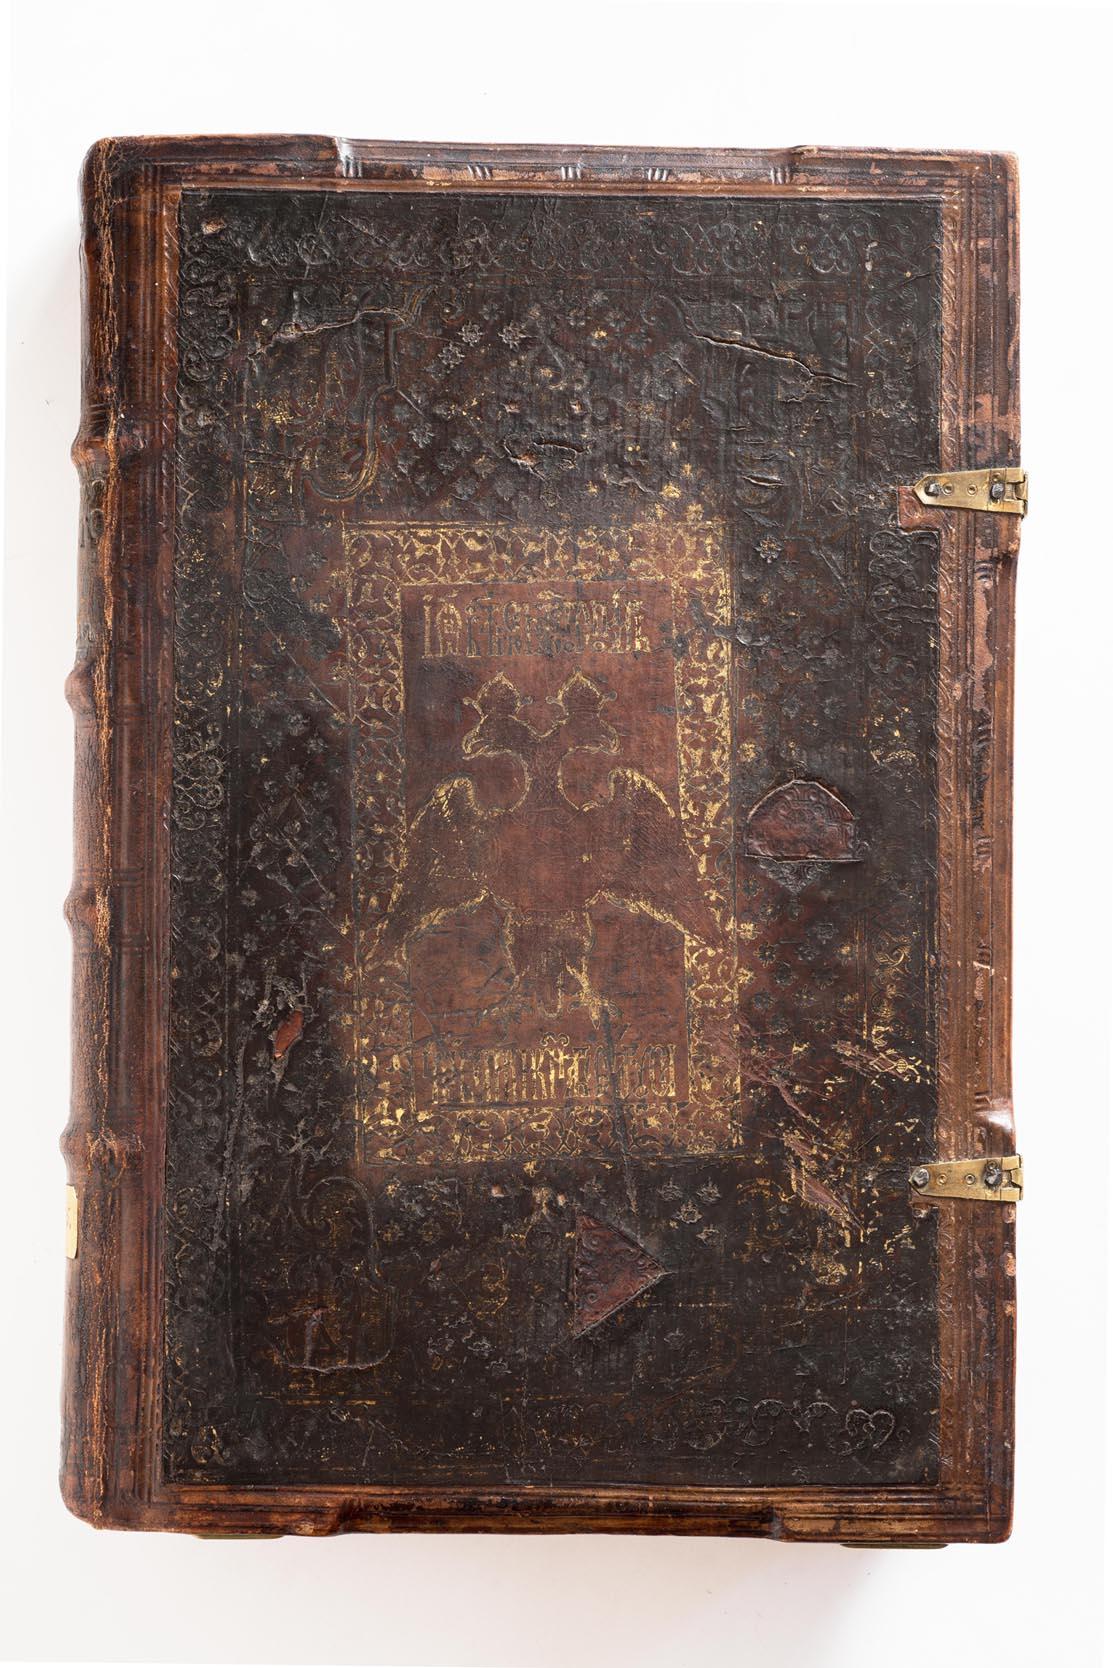 Апостол 1564 г. (ГИМ, Цар. А. 15). Тиснение верхней крышки переплета